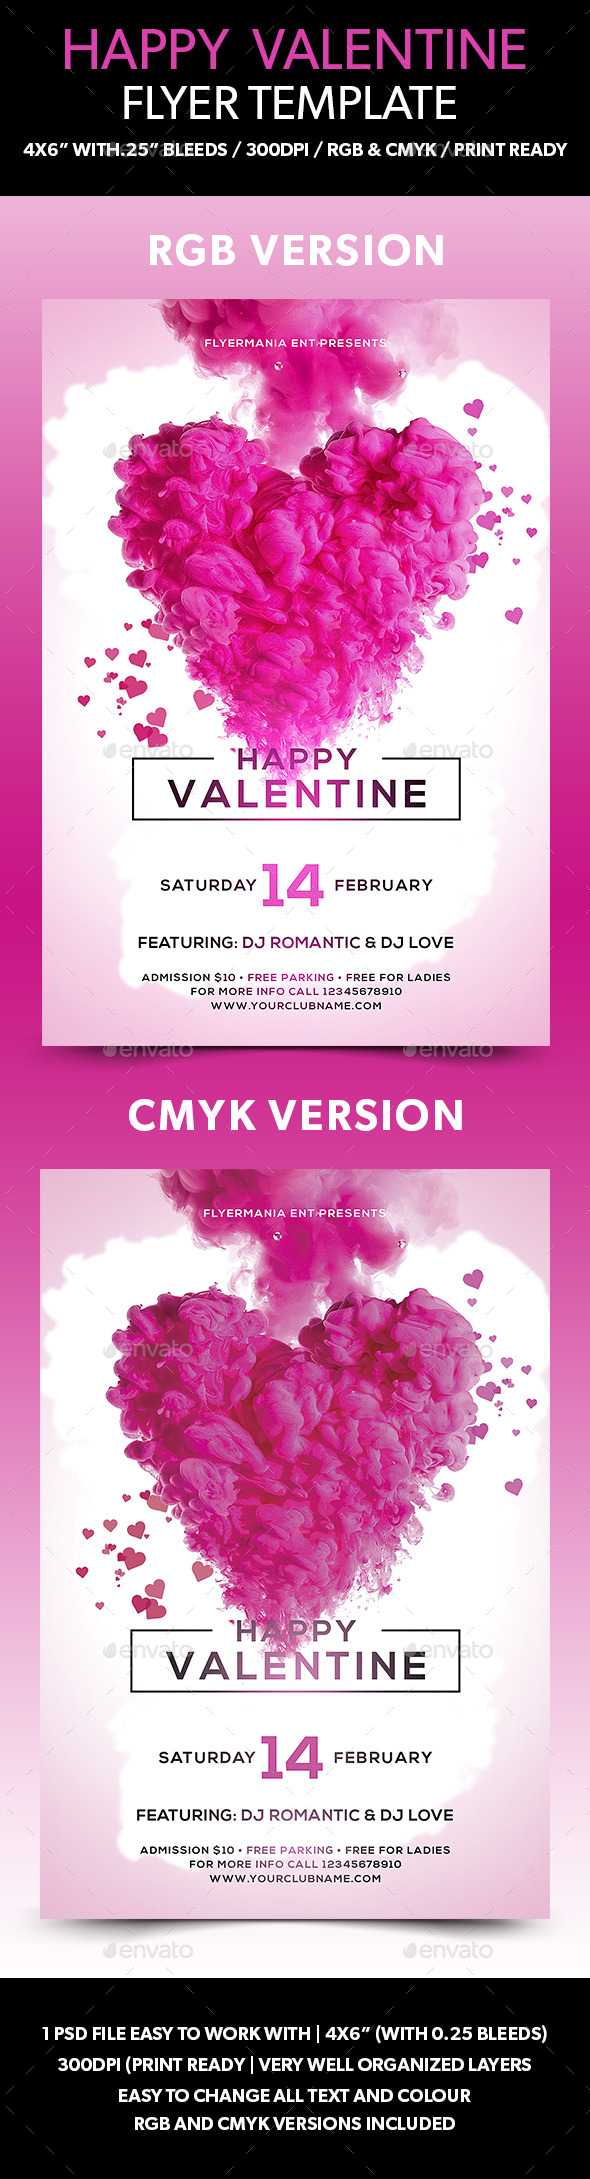 Happy Valentine Flyer Template